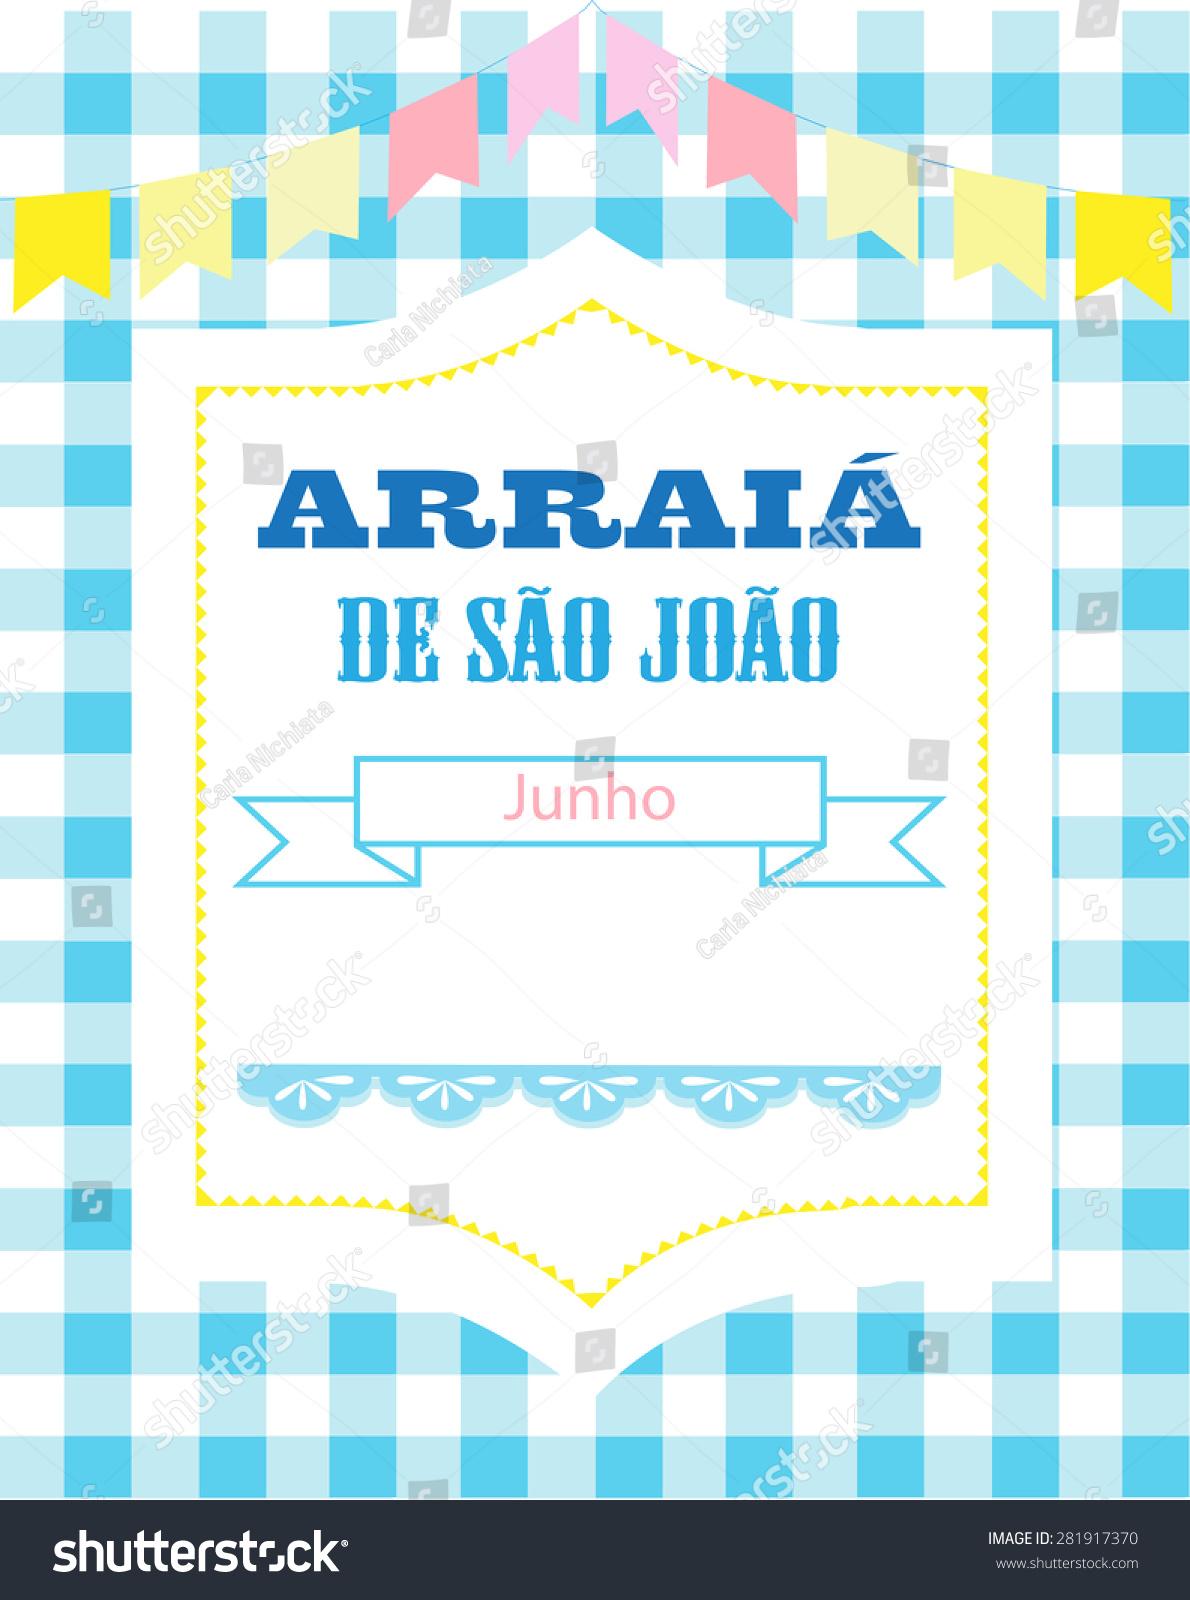 Invitation brazilian party arraia de sao stock vector 281917370 invitation for brazilian party arraia de sao joao message in portuguese language stopboris Image collections